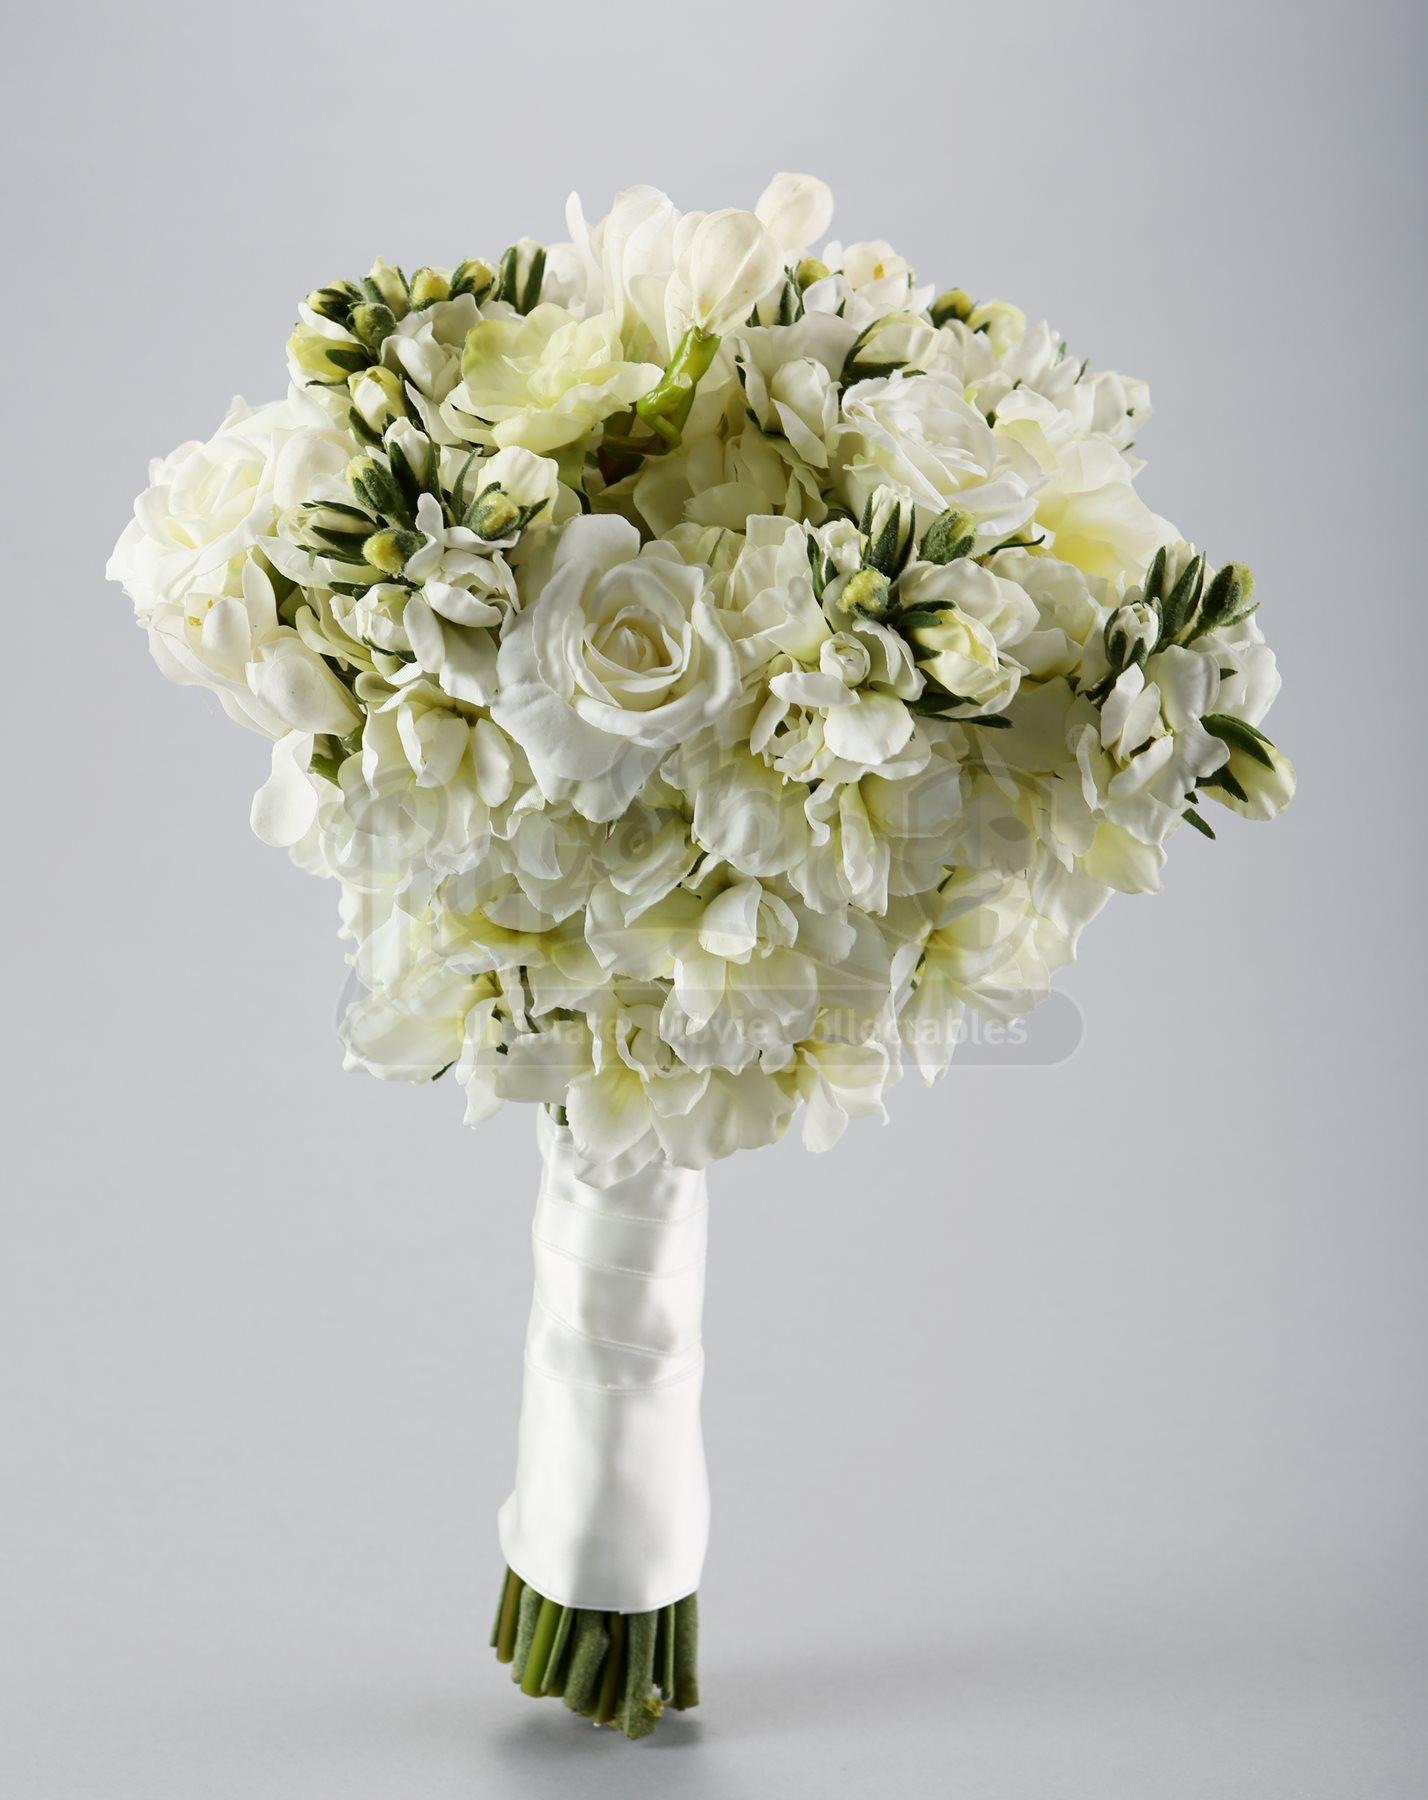 Bella swans wedding bouquet current price 2000 lot 504 bella swans wedding bouquet izmirmasajfo